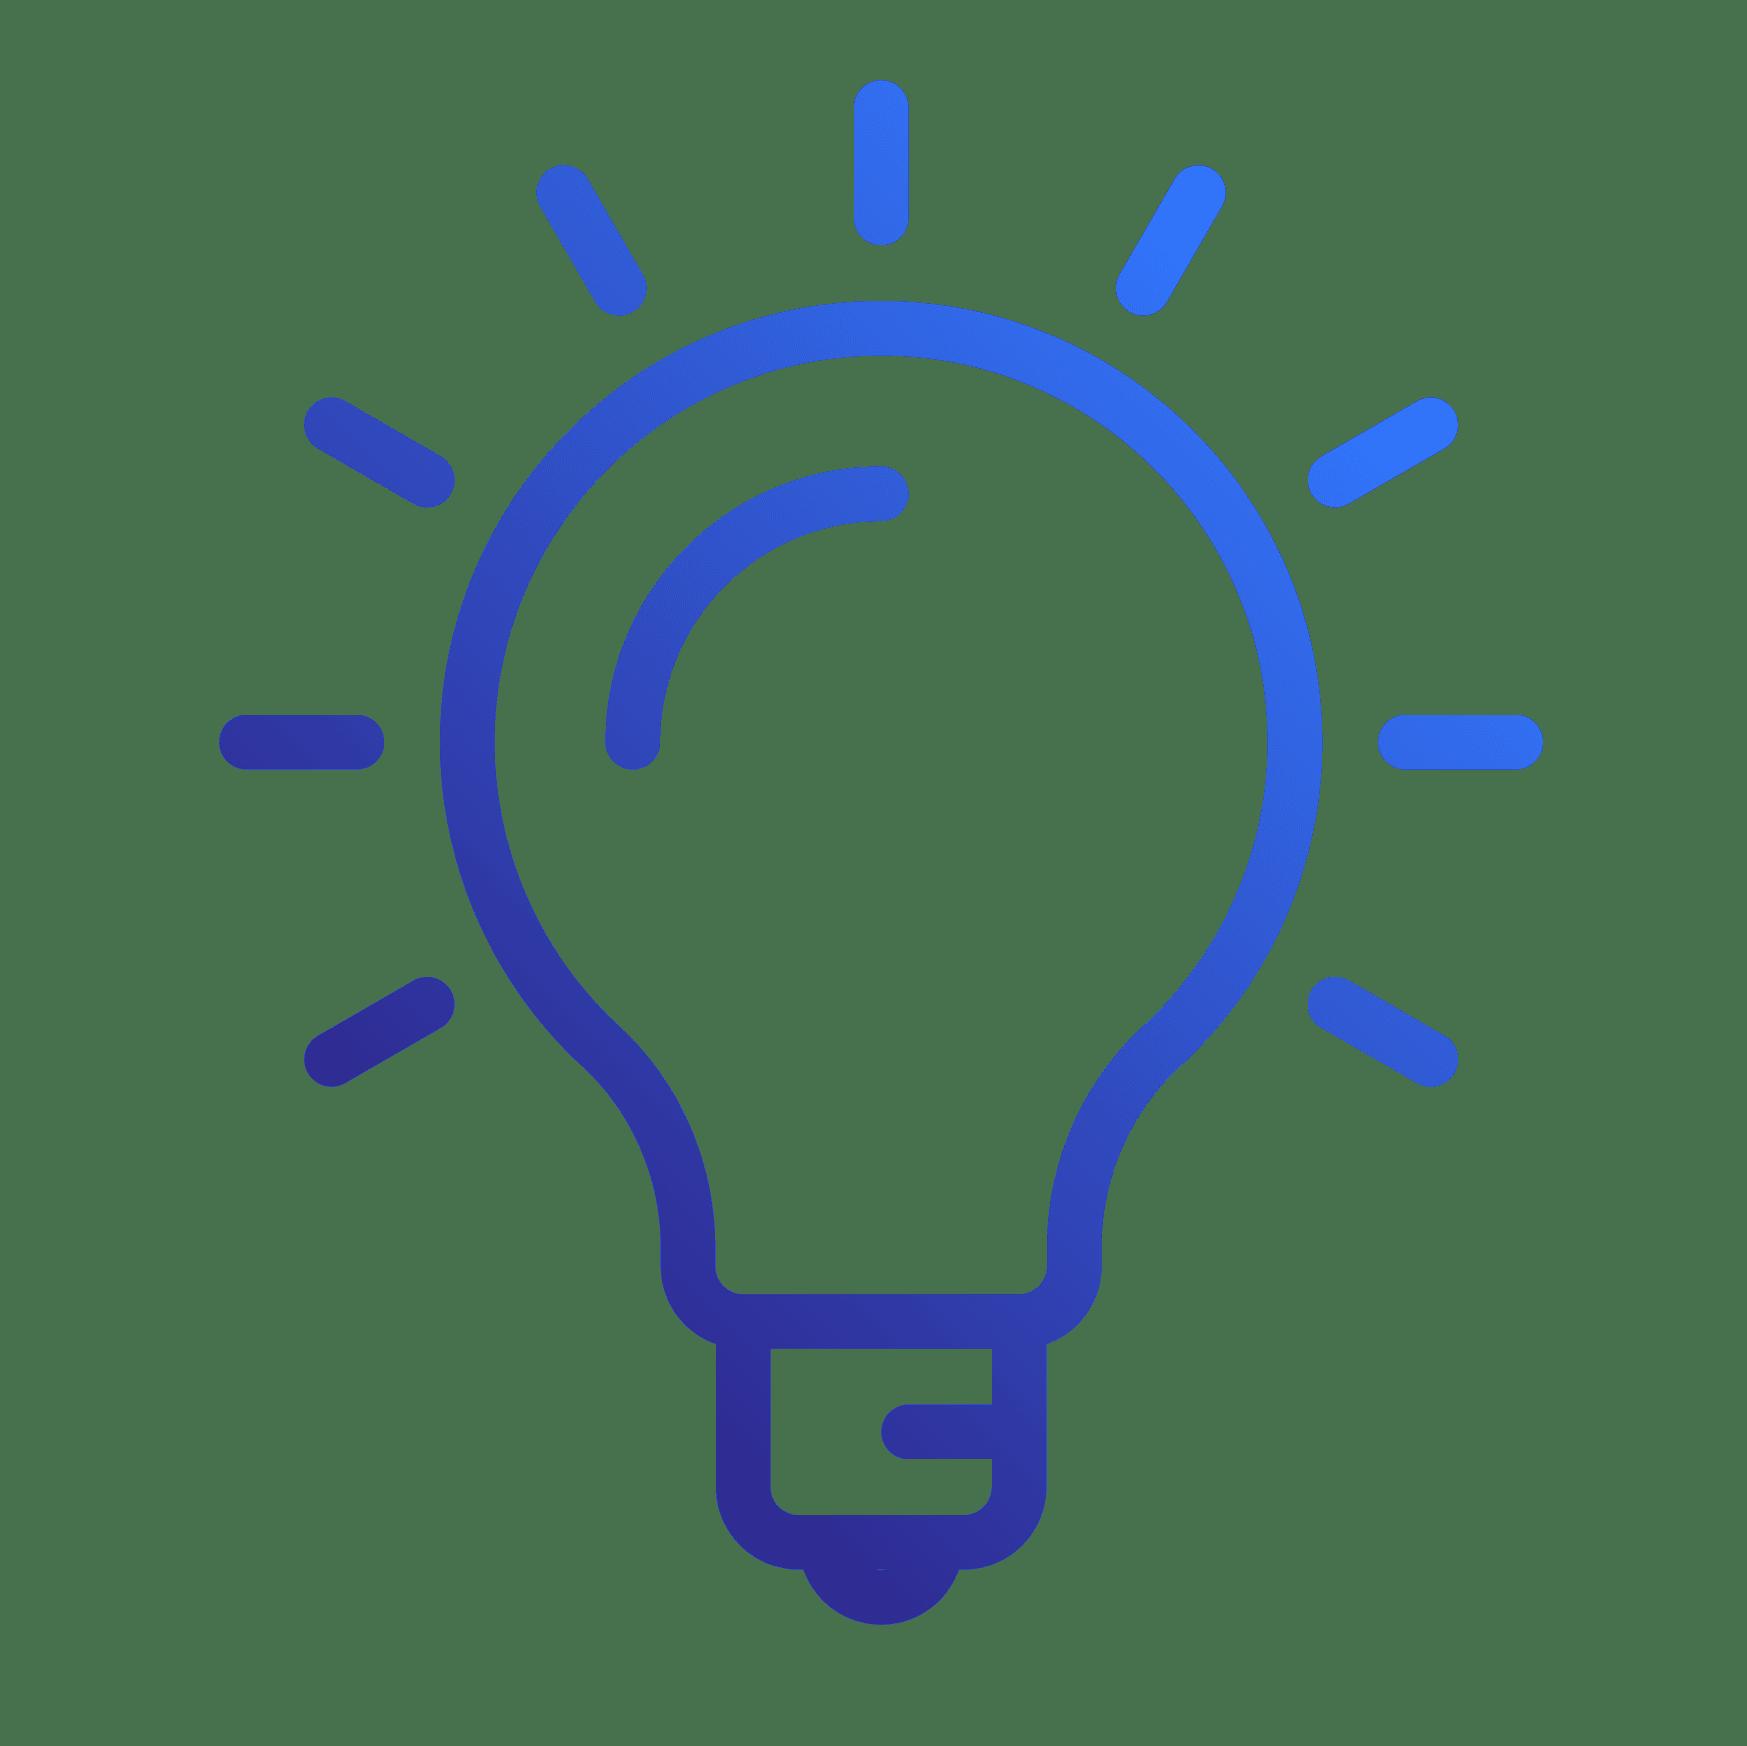 Innovation icon of a shining light bulb.